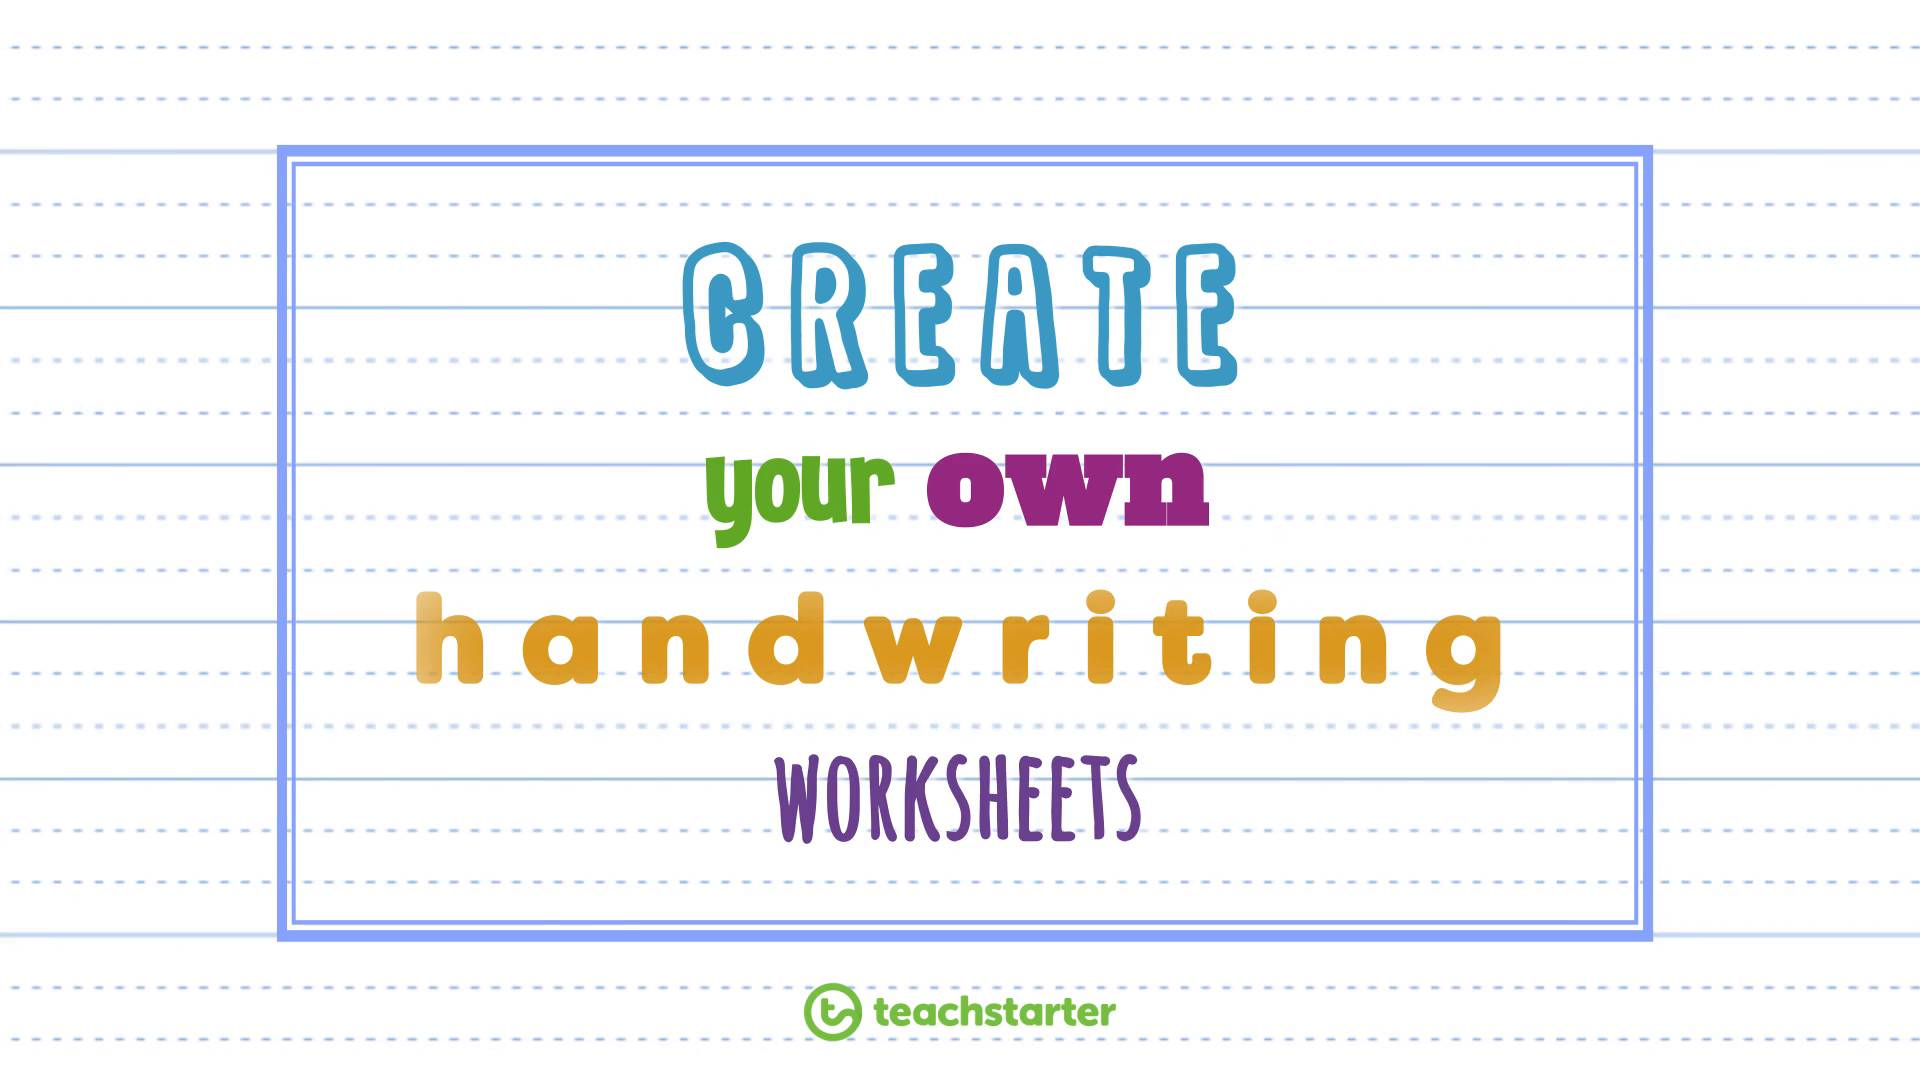 Create Your Own Handwriting Sheets Easily Handwriting Generator